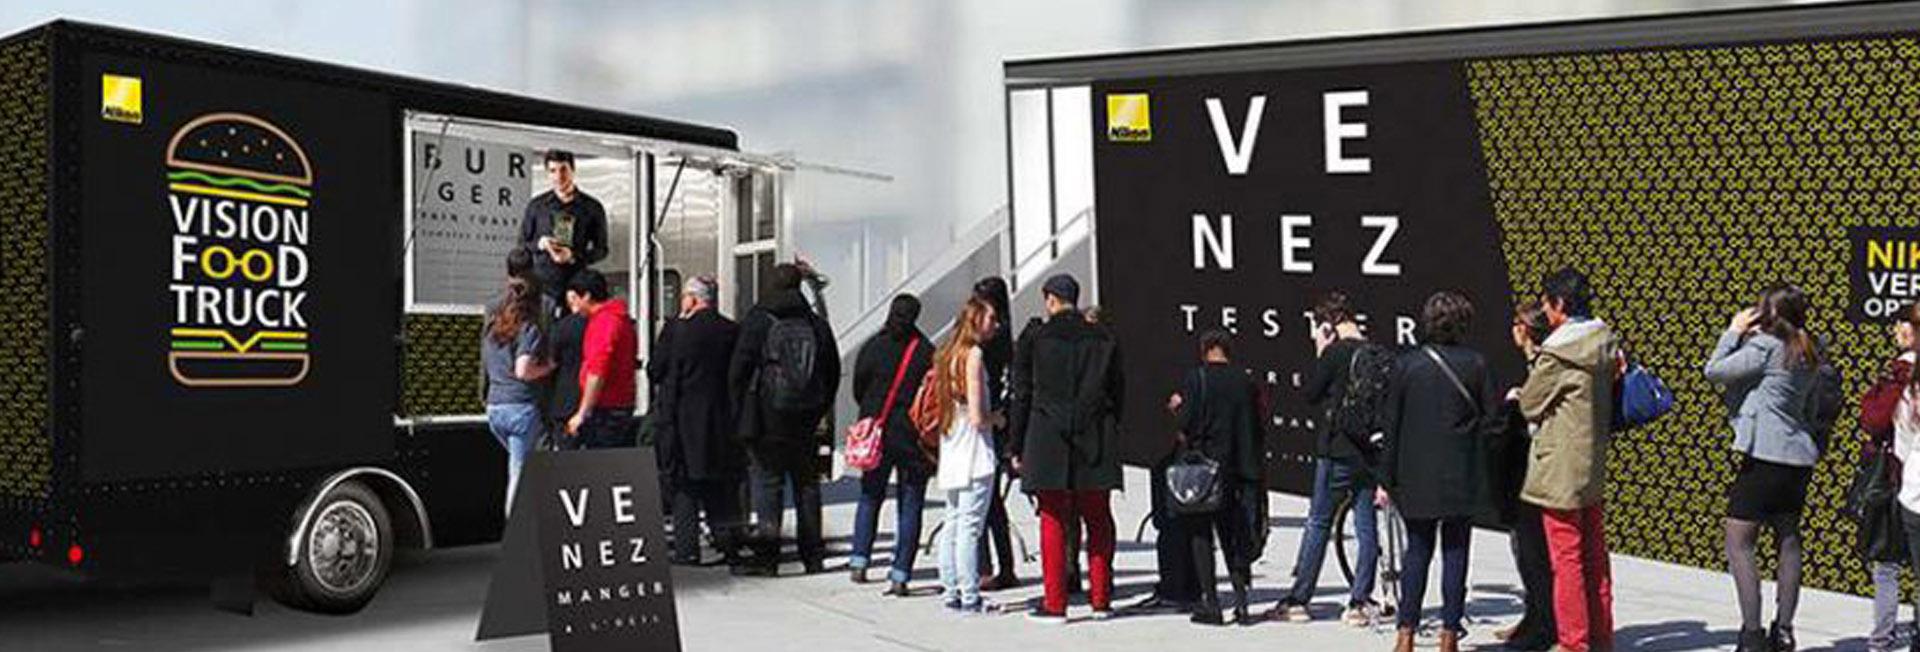 Nikon Burger Truck